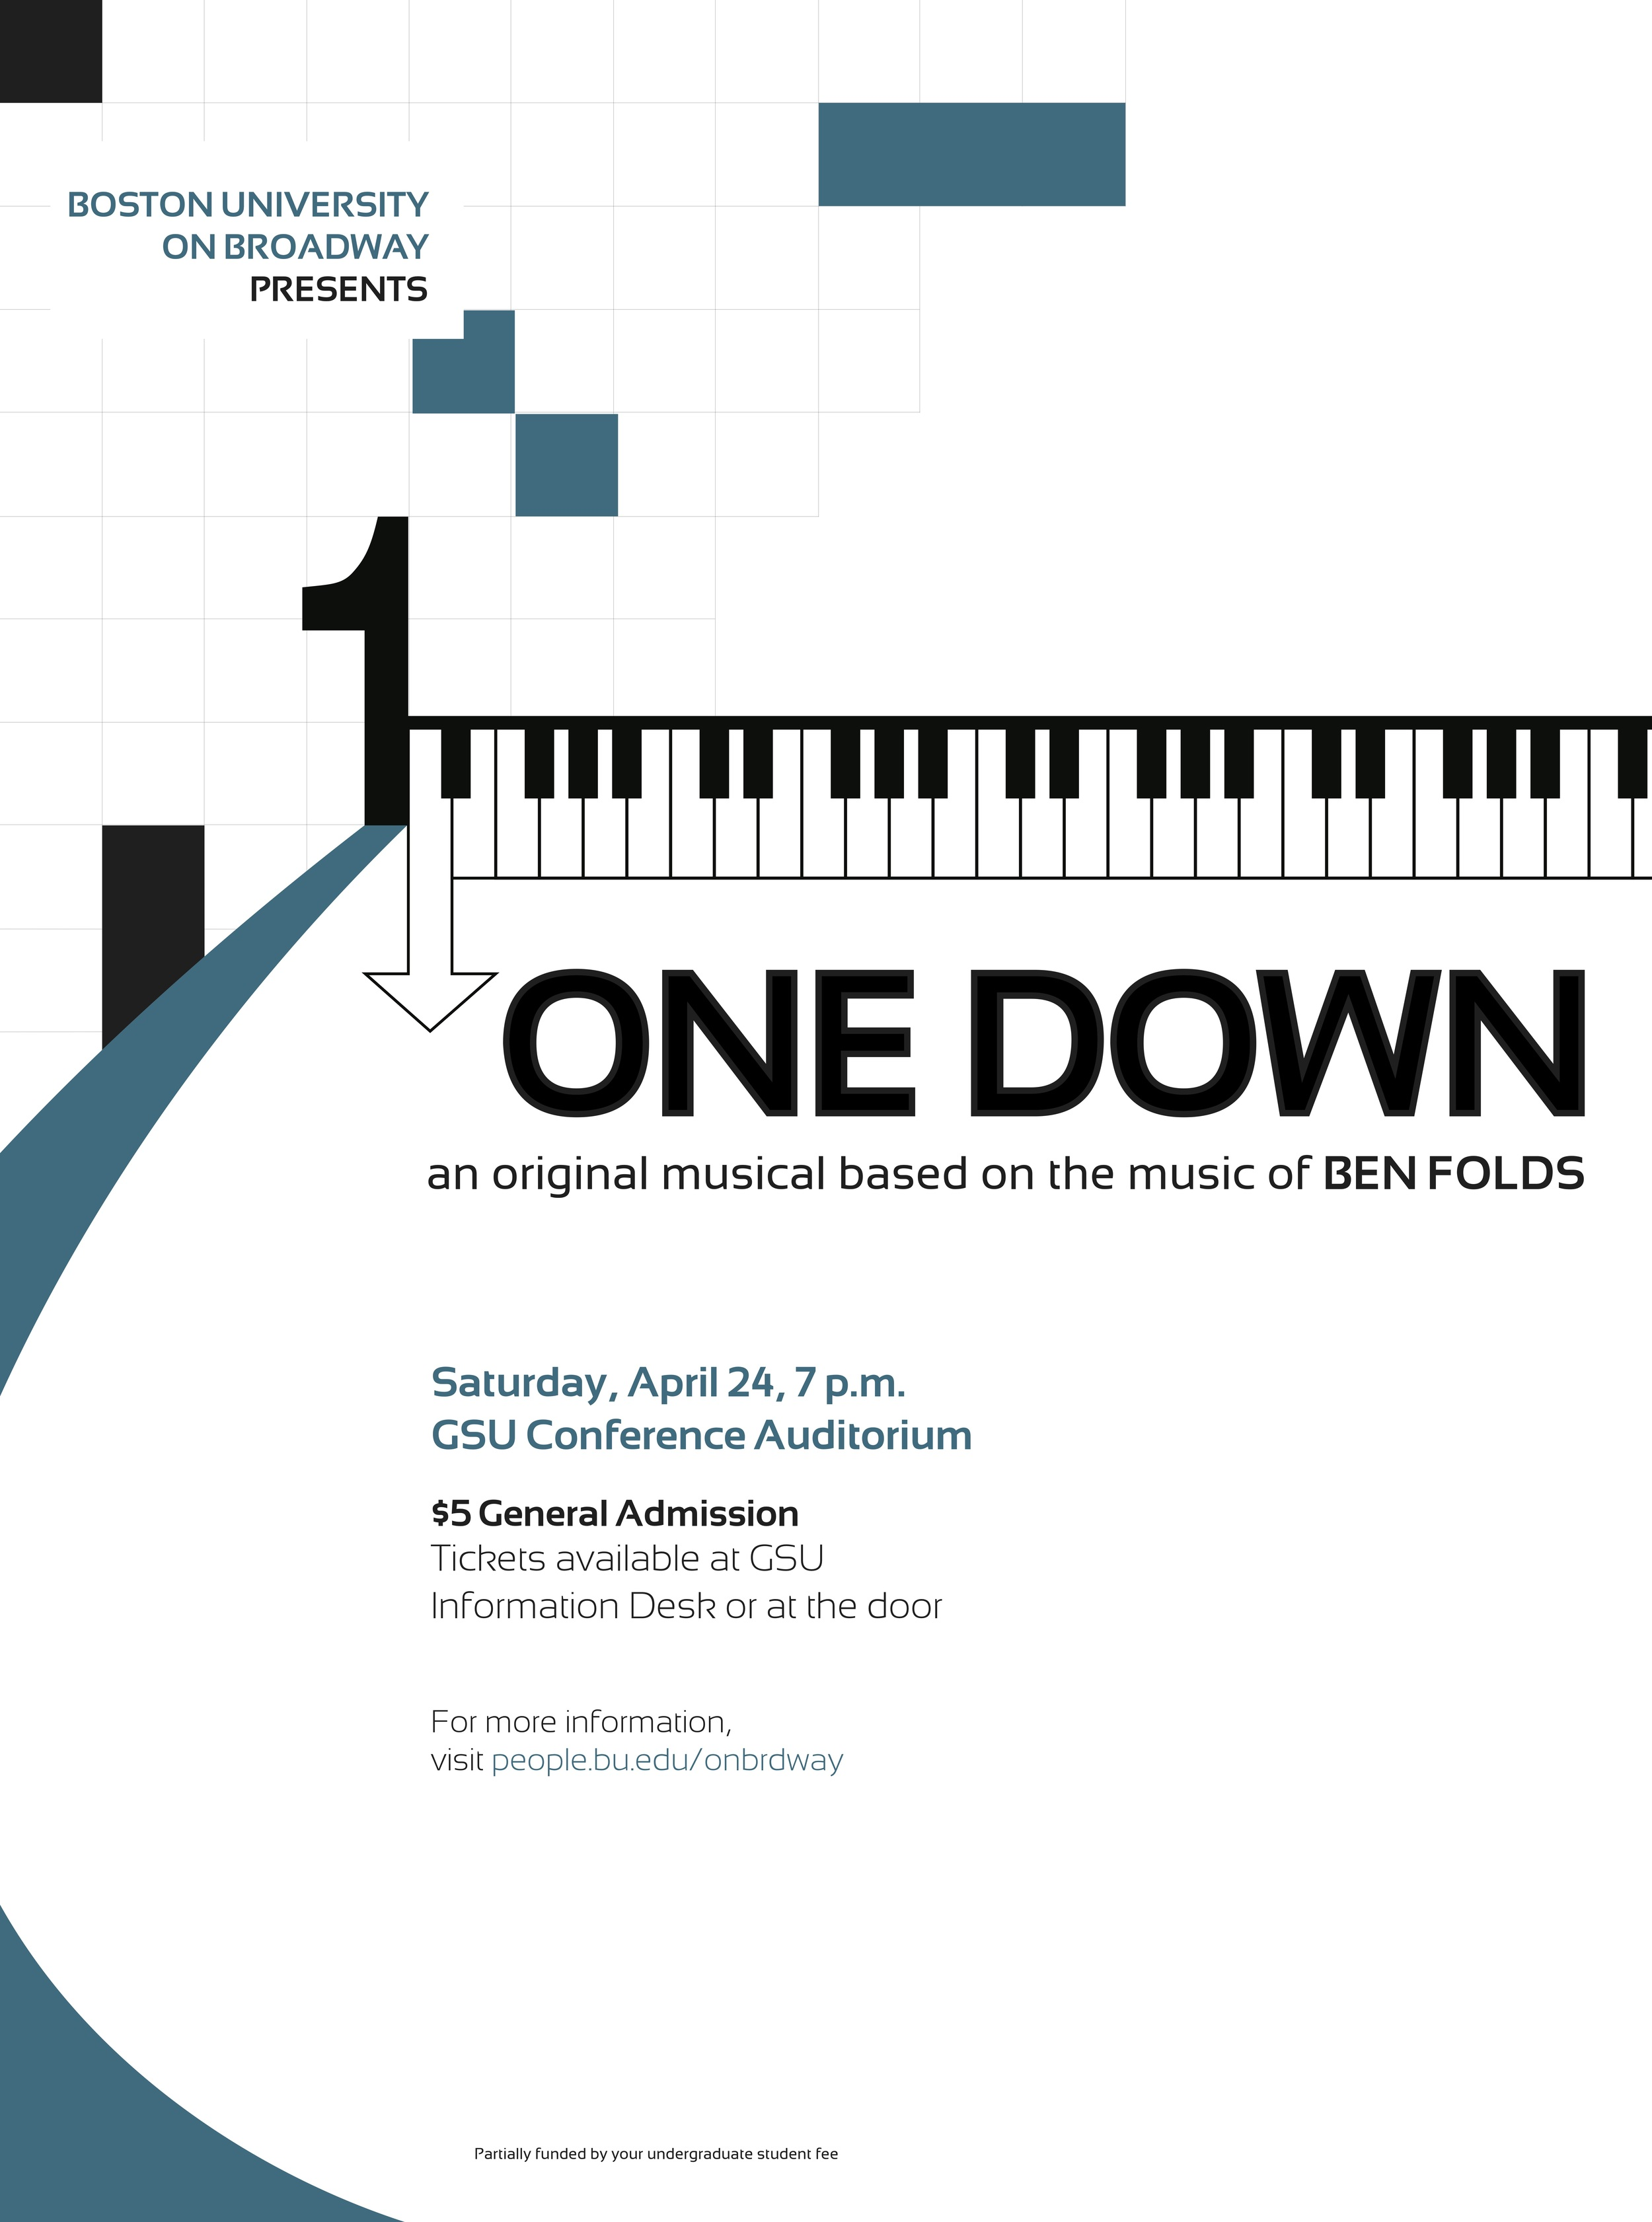 """One Down: An original musical of Ben Folds"" Spring 2010"